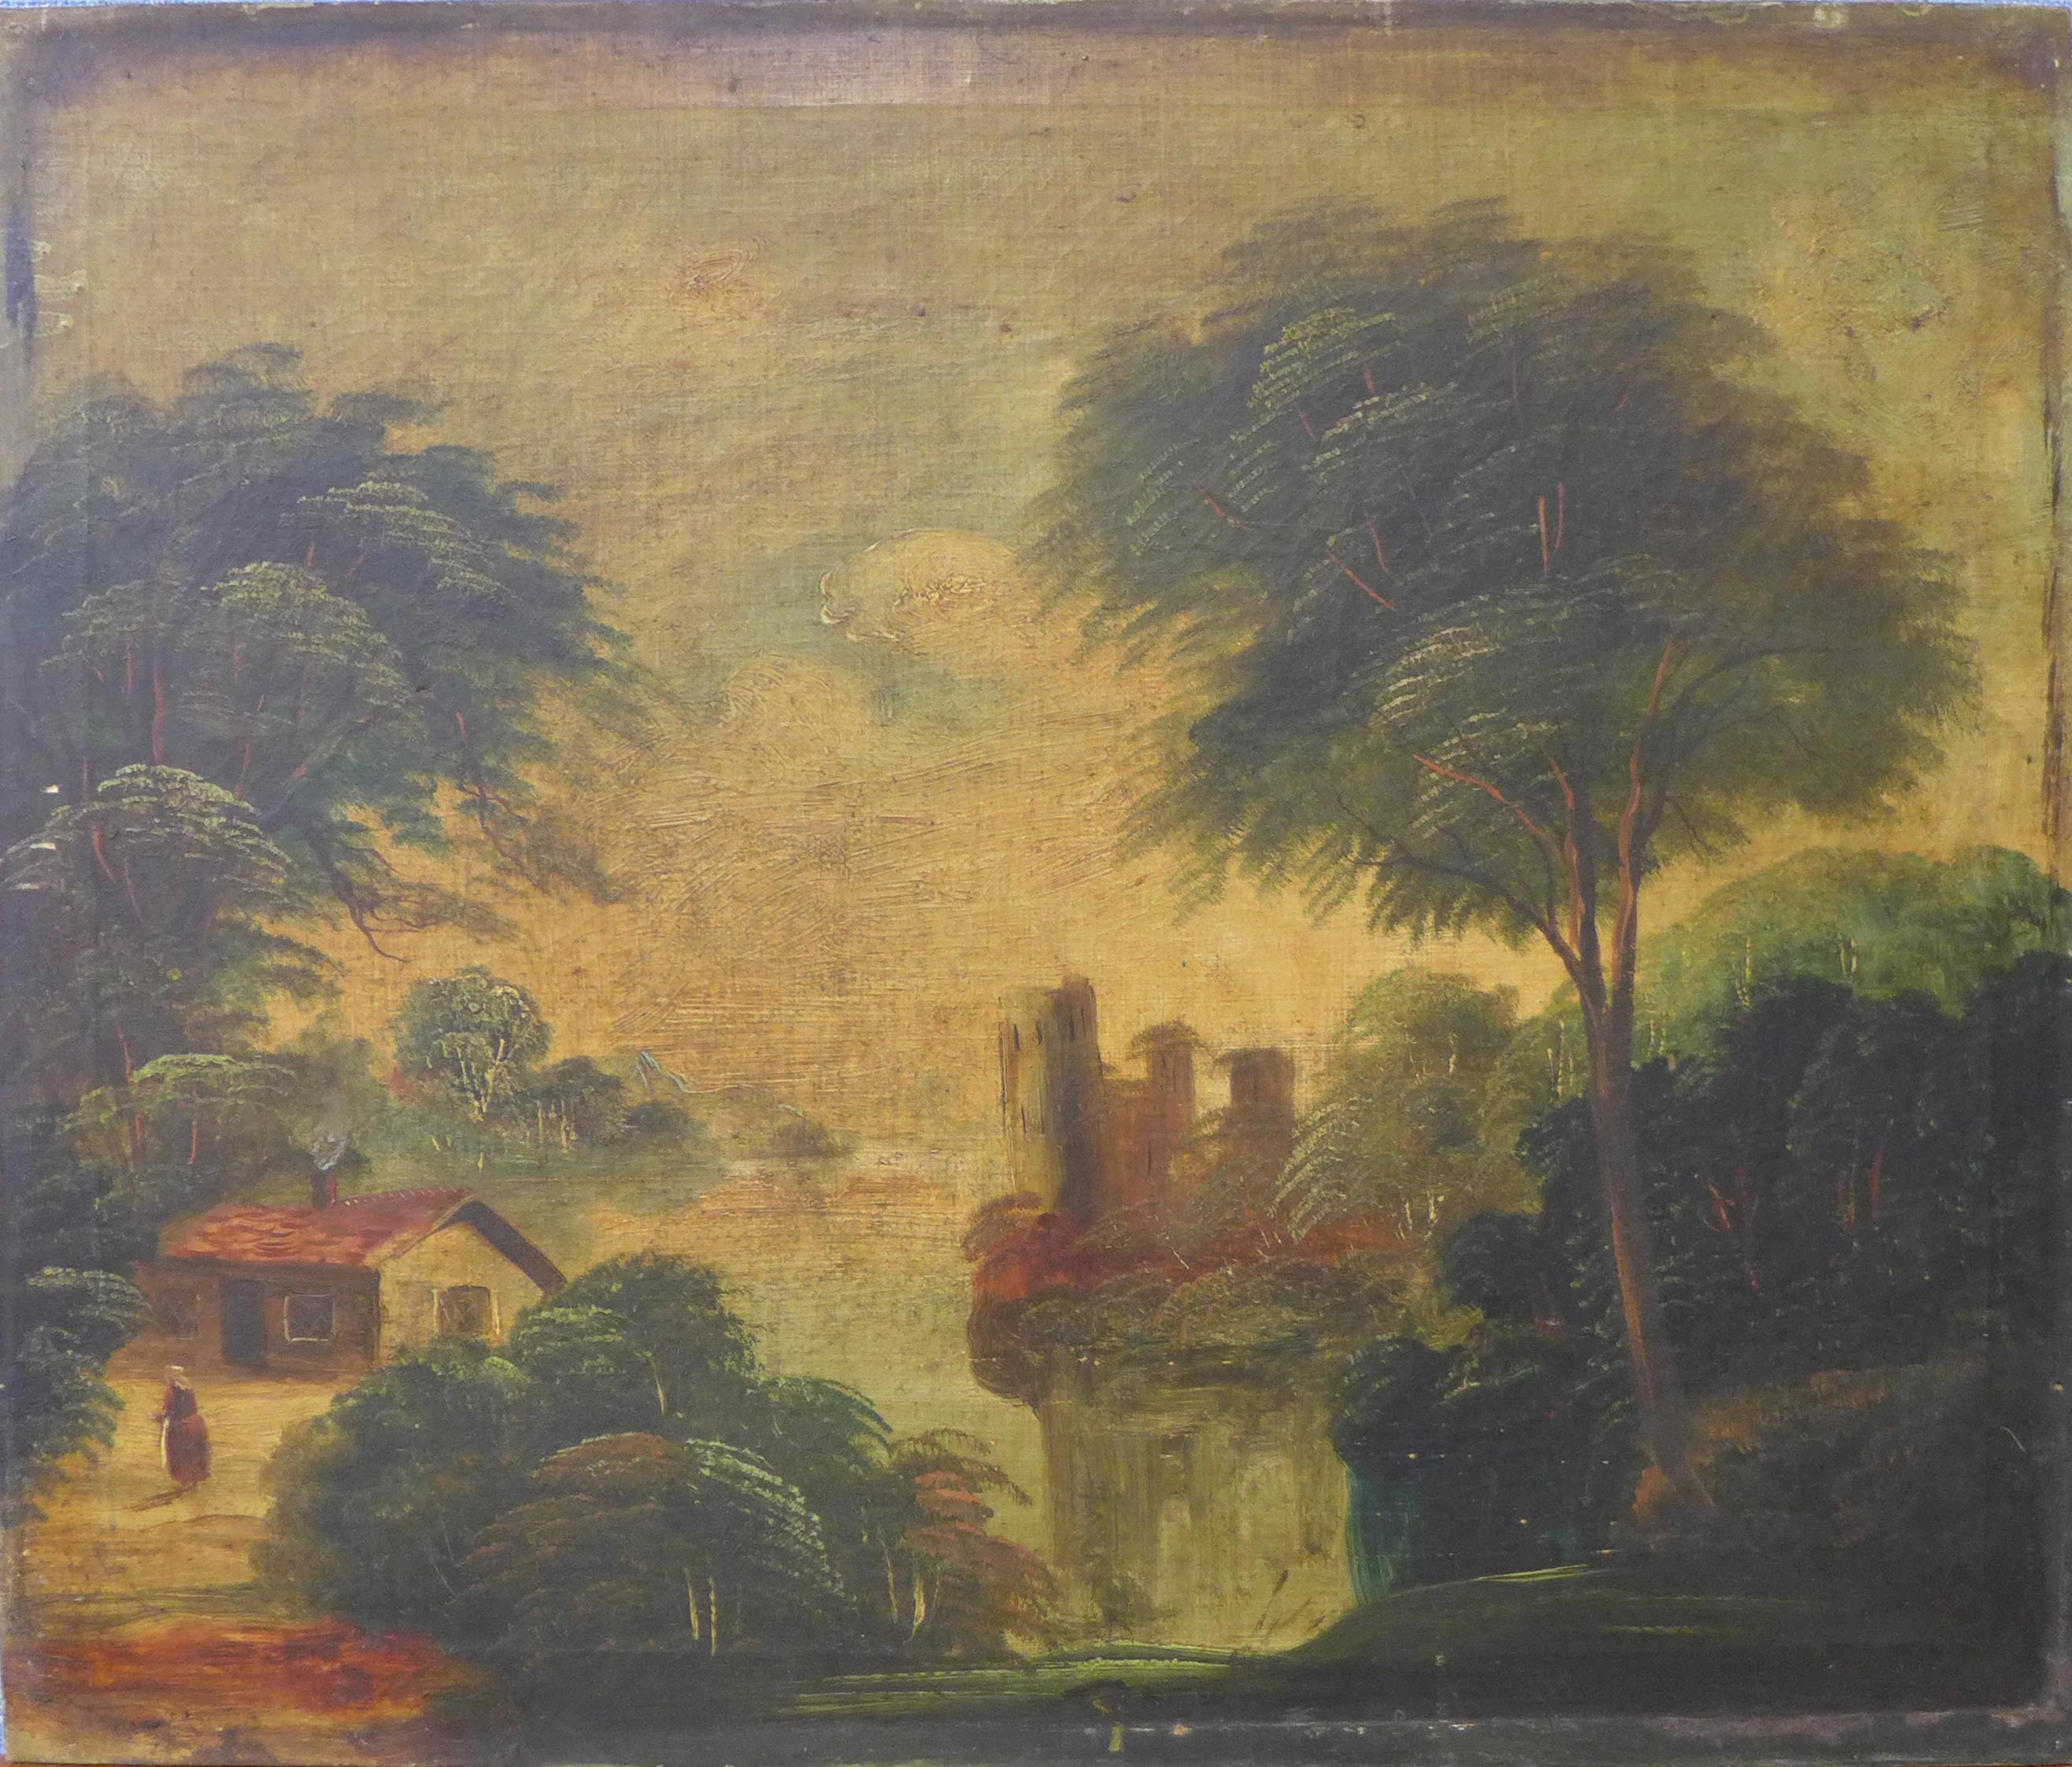 Lot 24 - English School (19th Century), landscape, oil on canvas, 51 x 61cms,